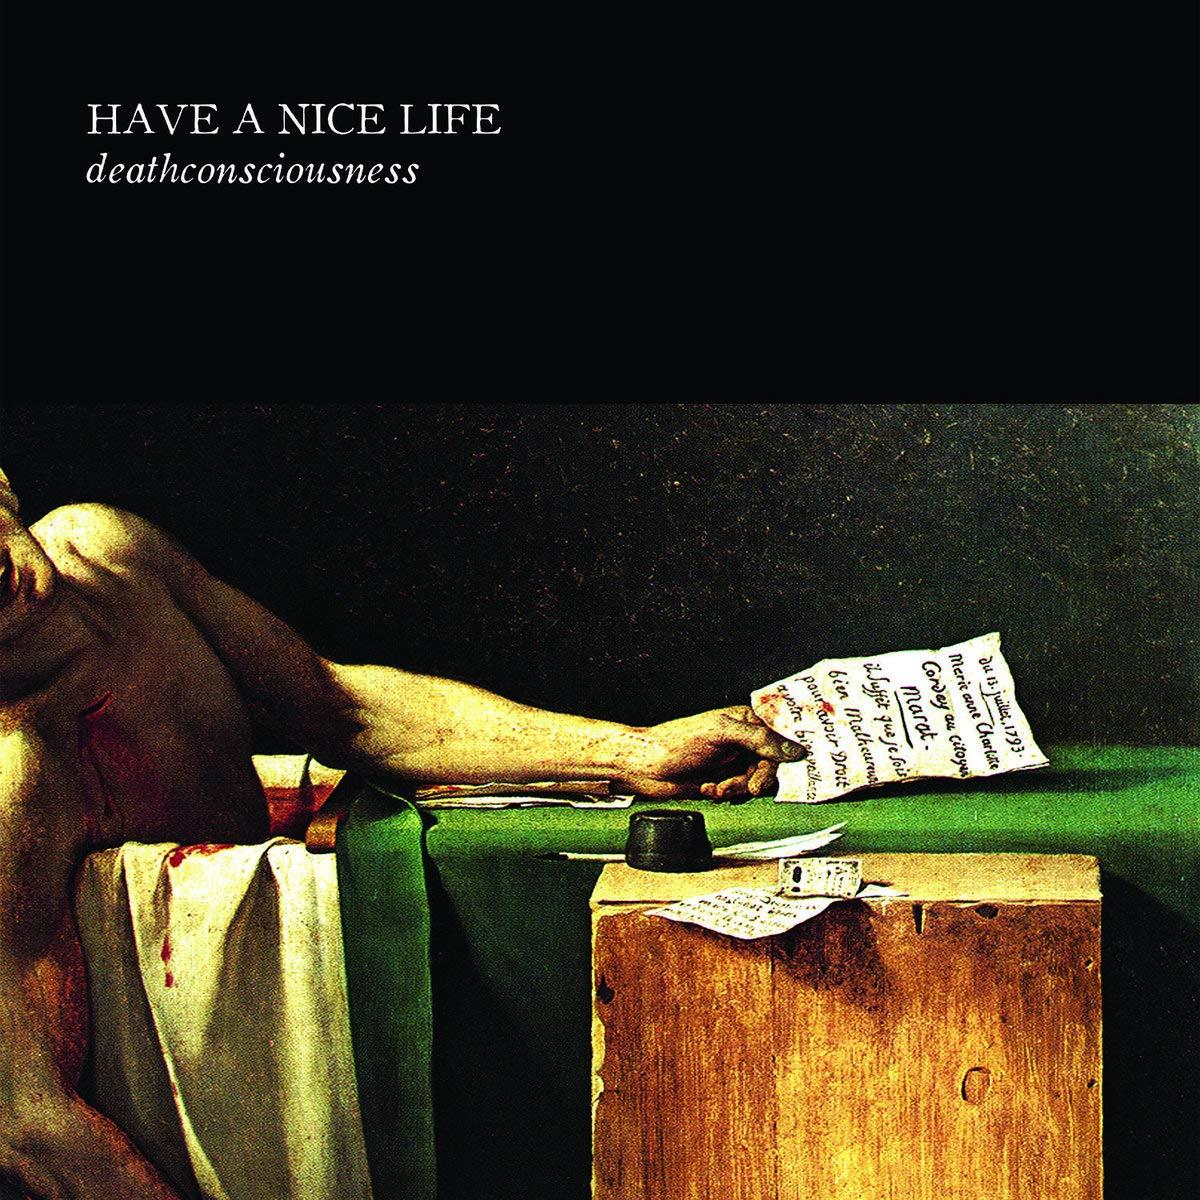 Risultato immagini per have a nice life deathconsciousness